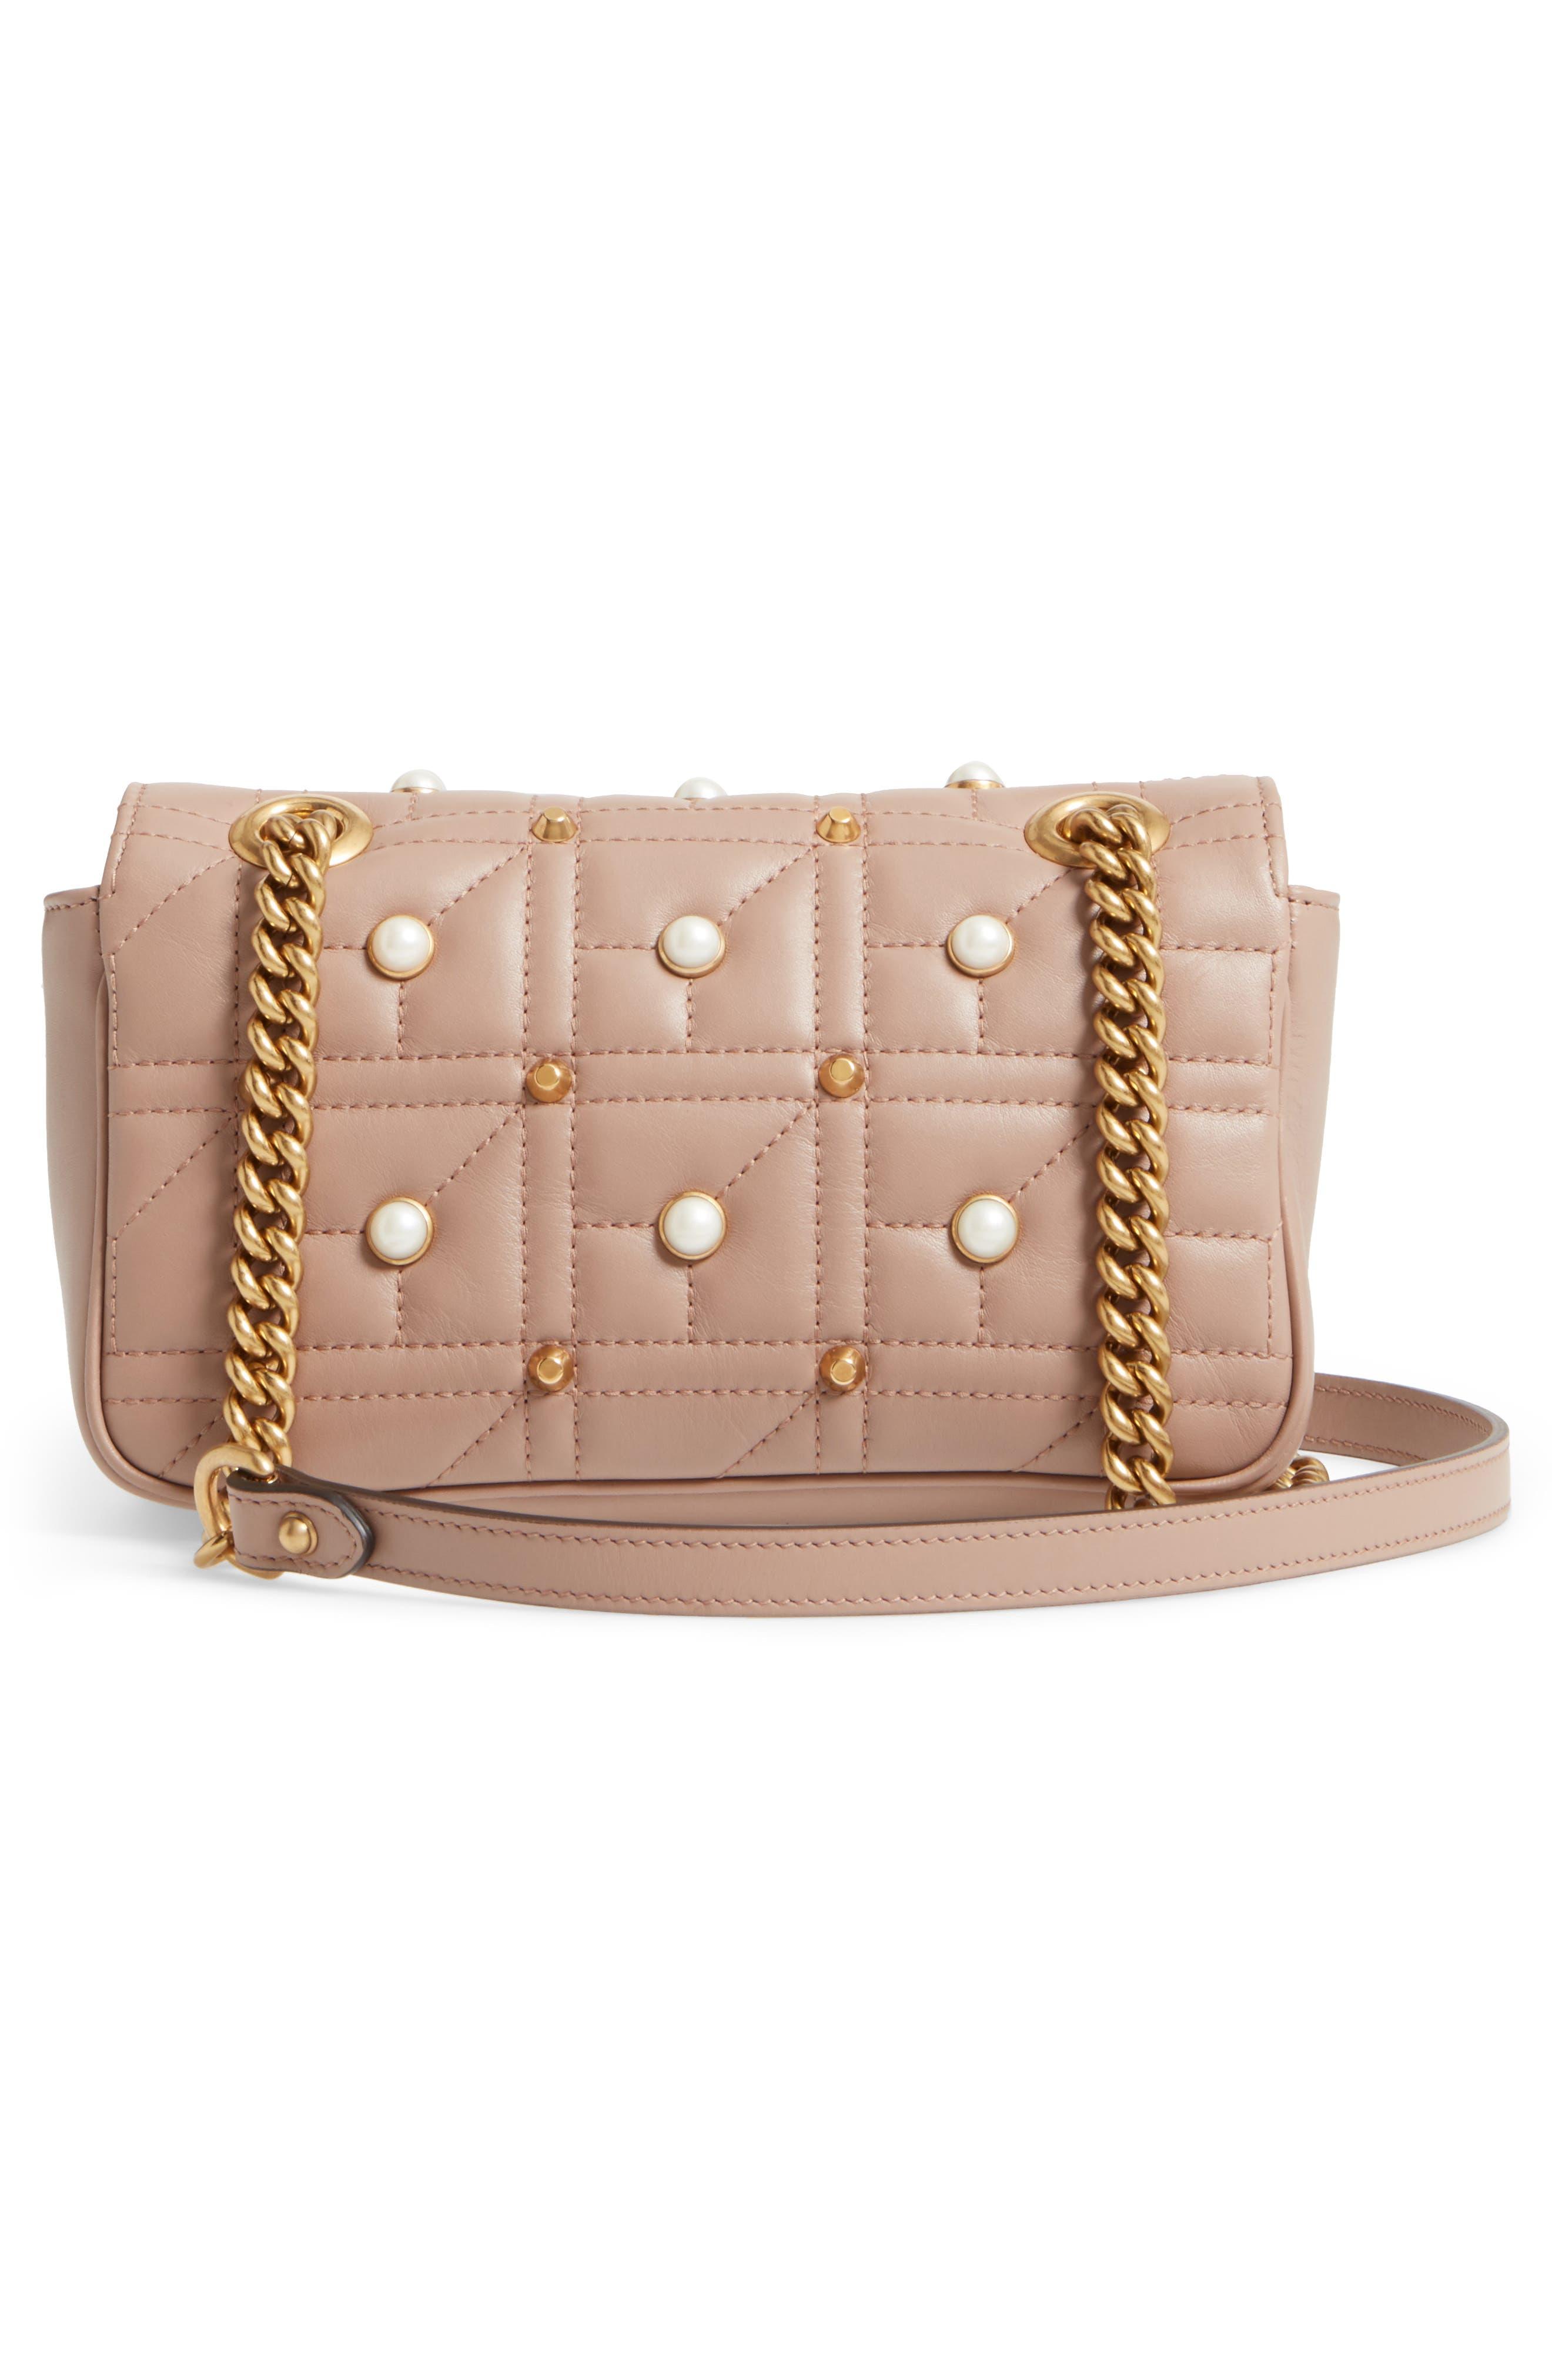 GUCCI, Mini GG Marmont 2.0 Imitation Pearl Logo Matelassé Leather Shoulder Bag, Alternate thumbnail 3, color, 651